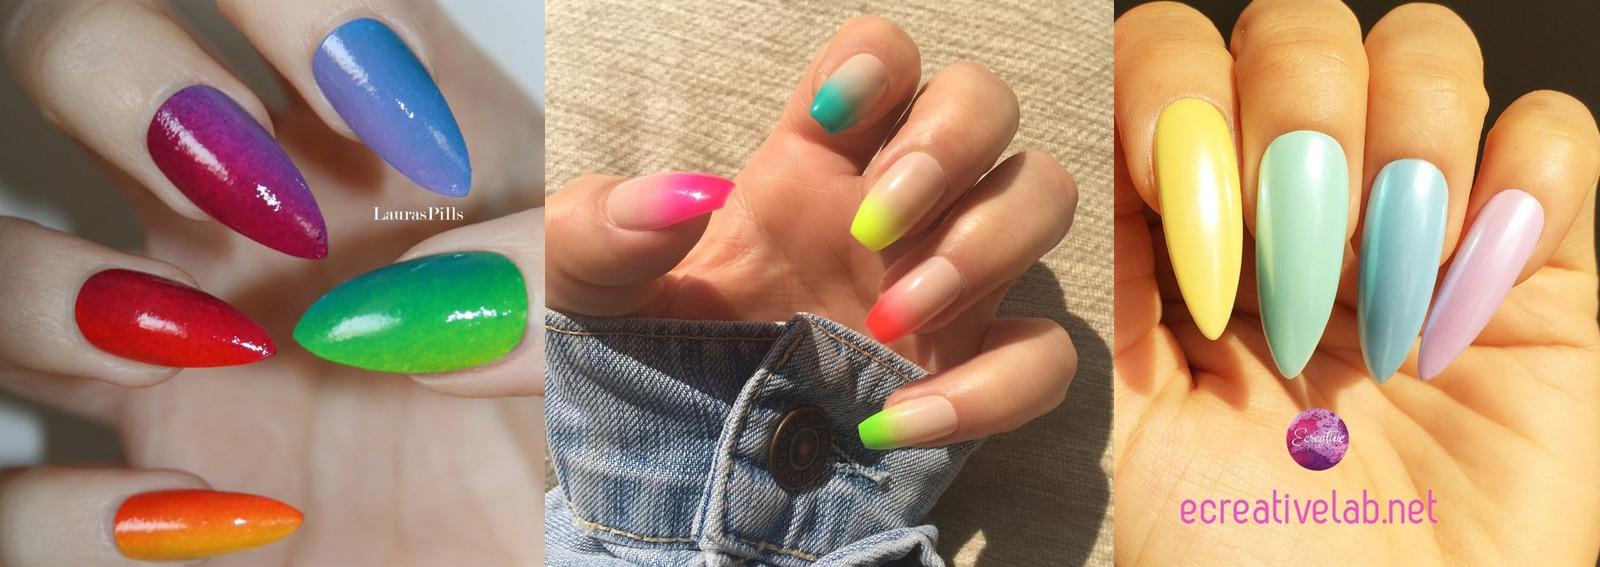 skittles-manicure-nail-art-unghie-caramelle-colorate-cover-desktop